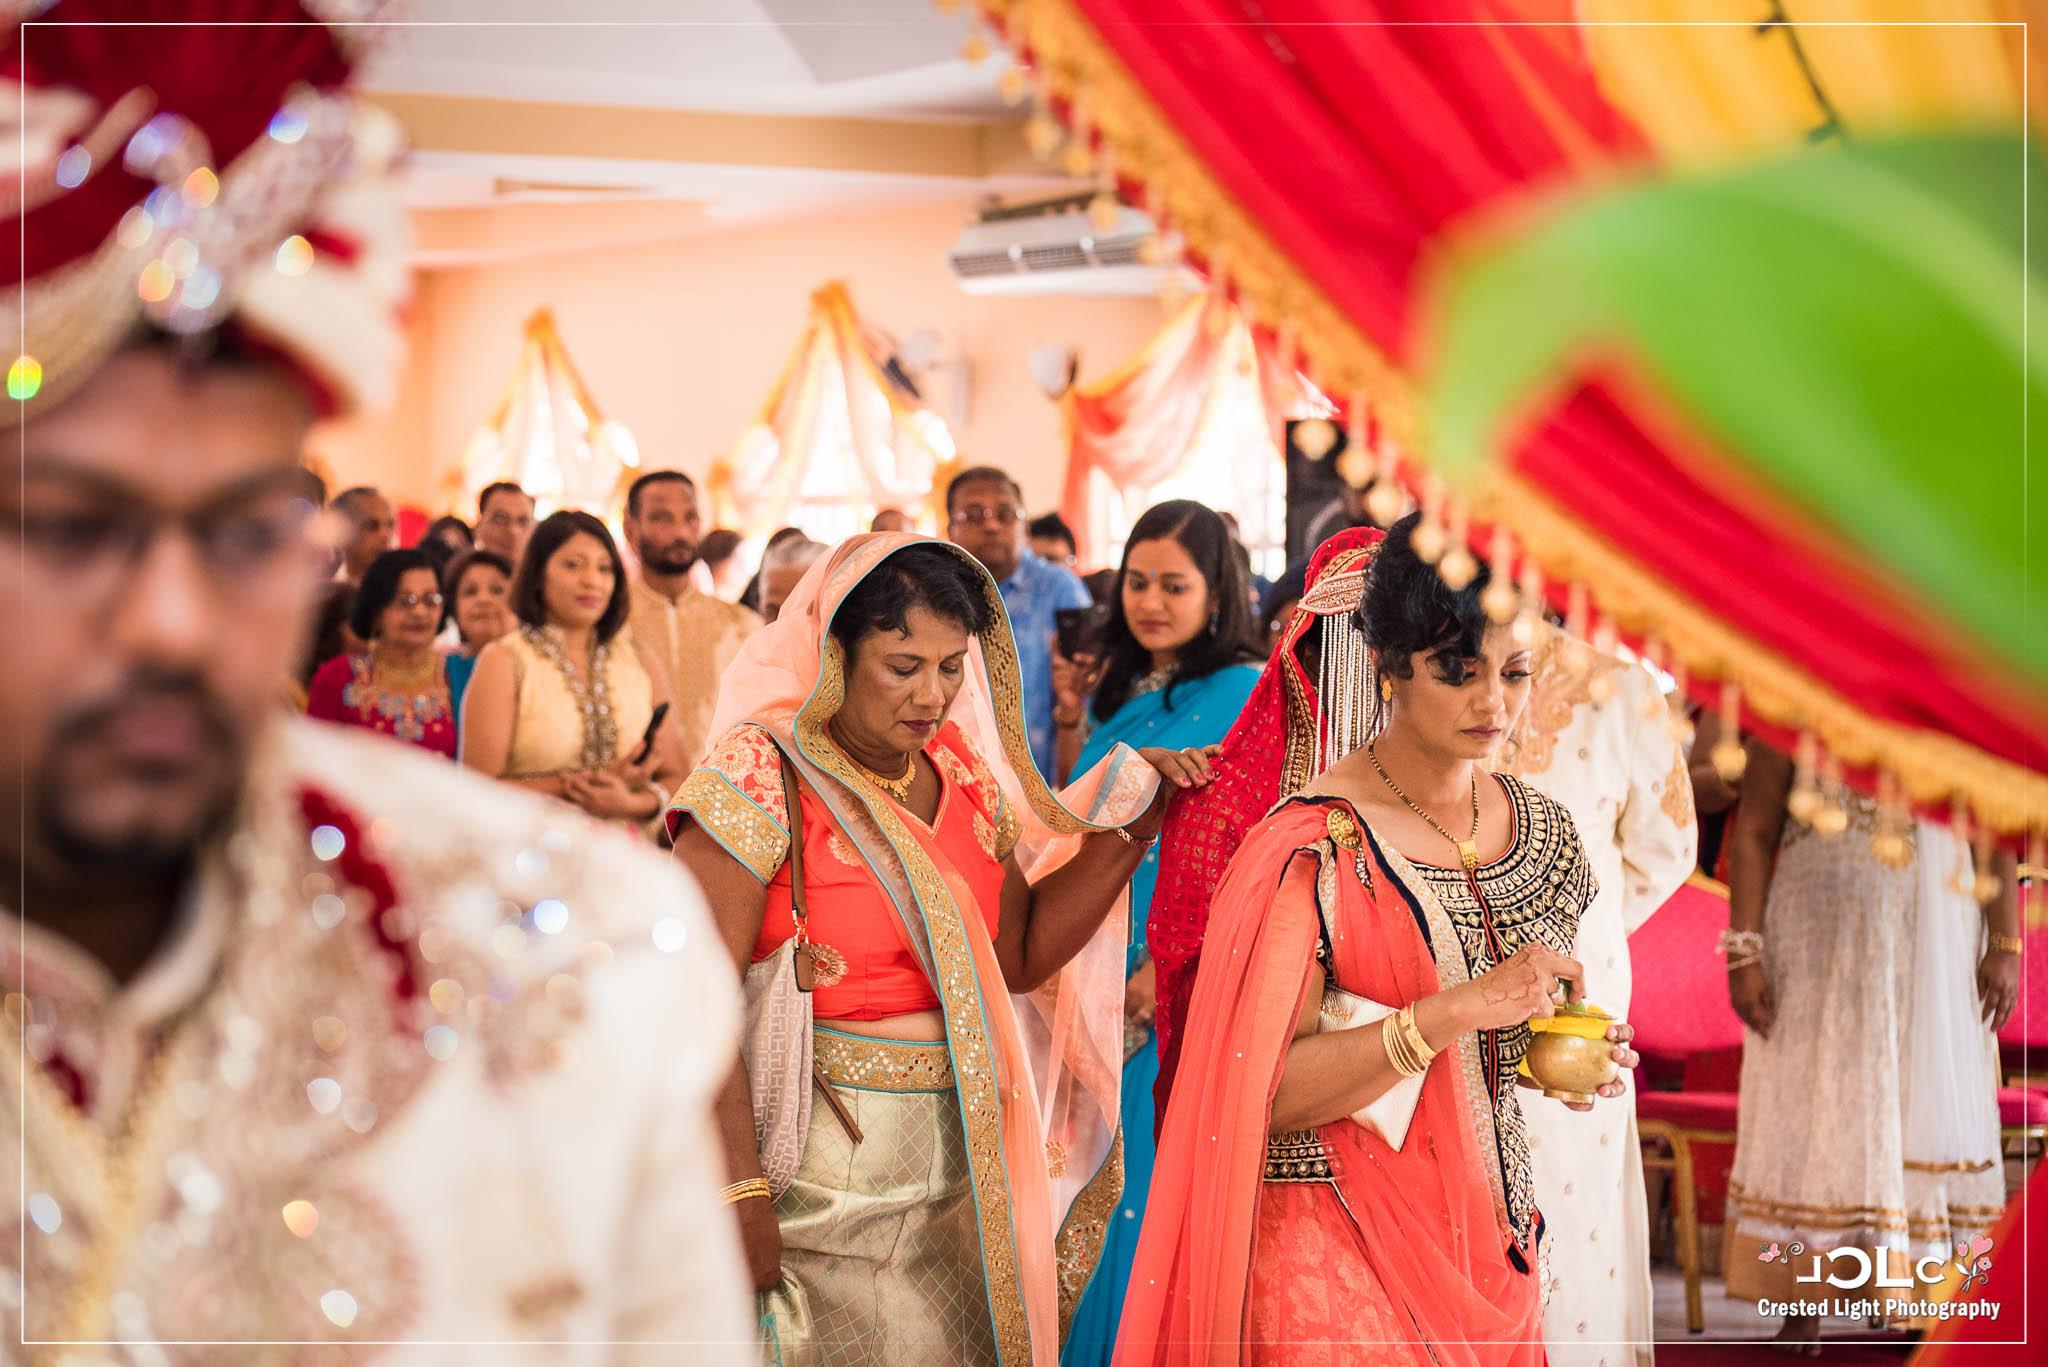 Devi mandir Trinidad Hindu wedding 19.jpg